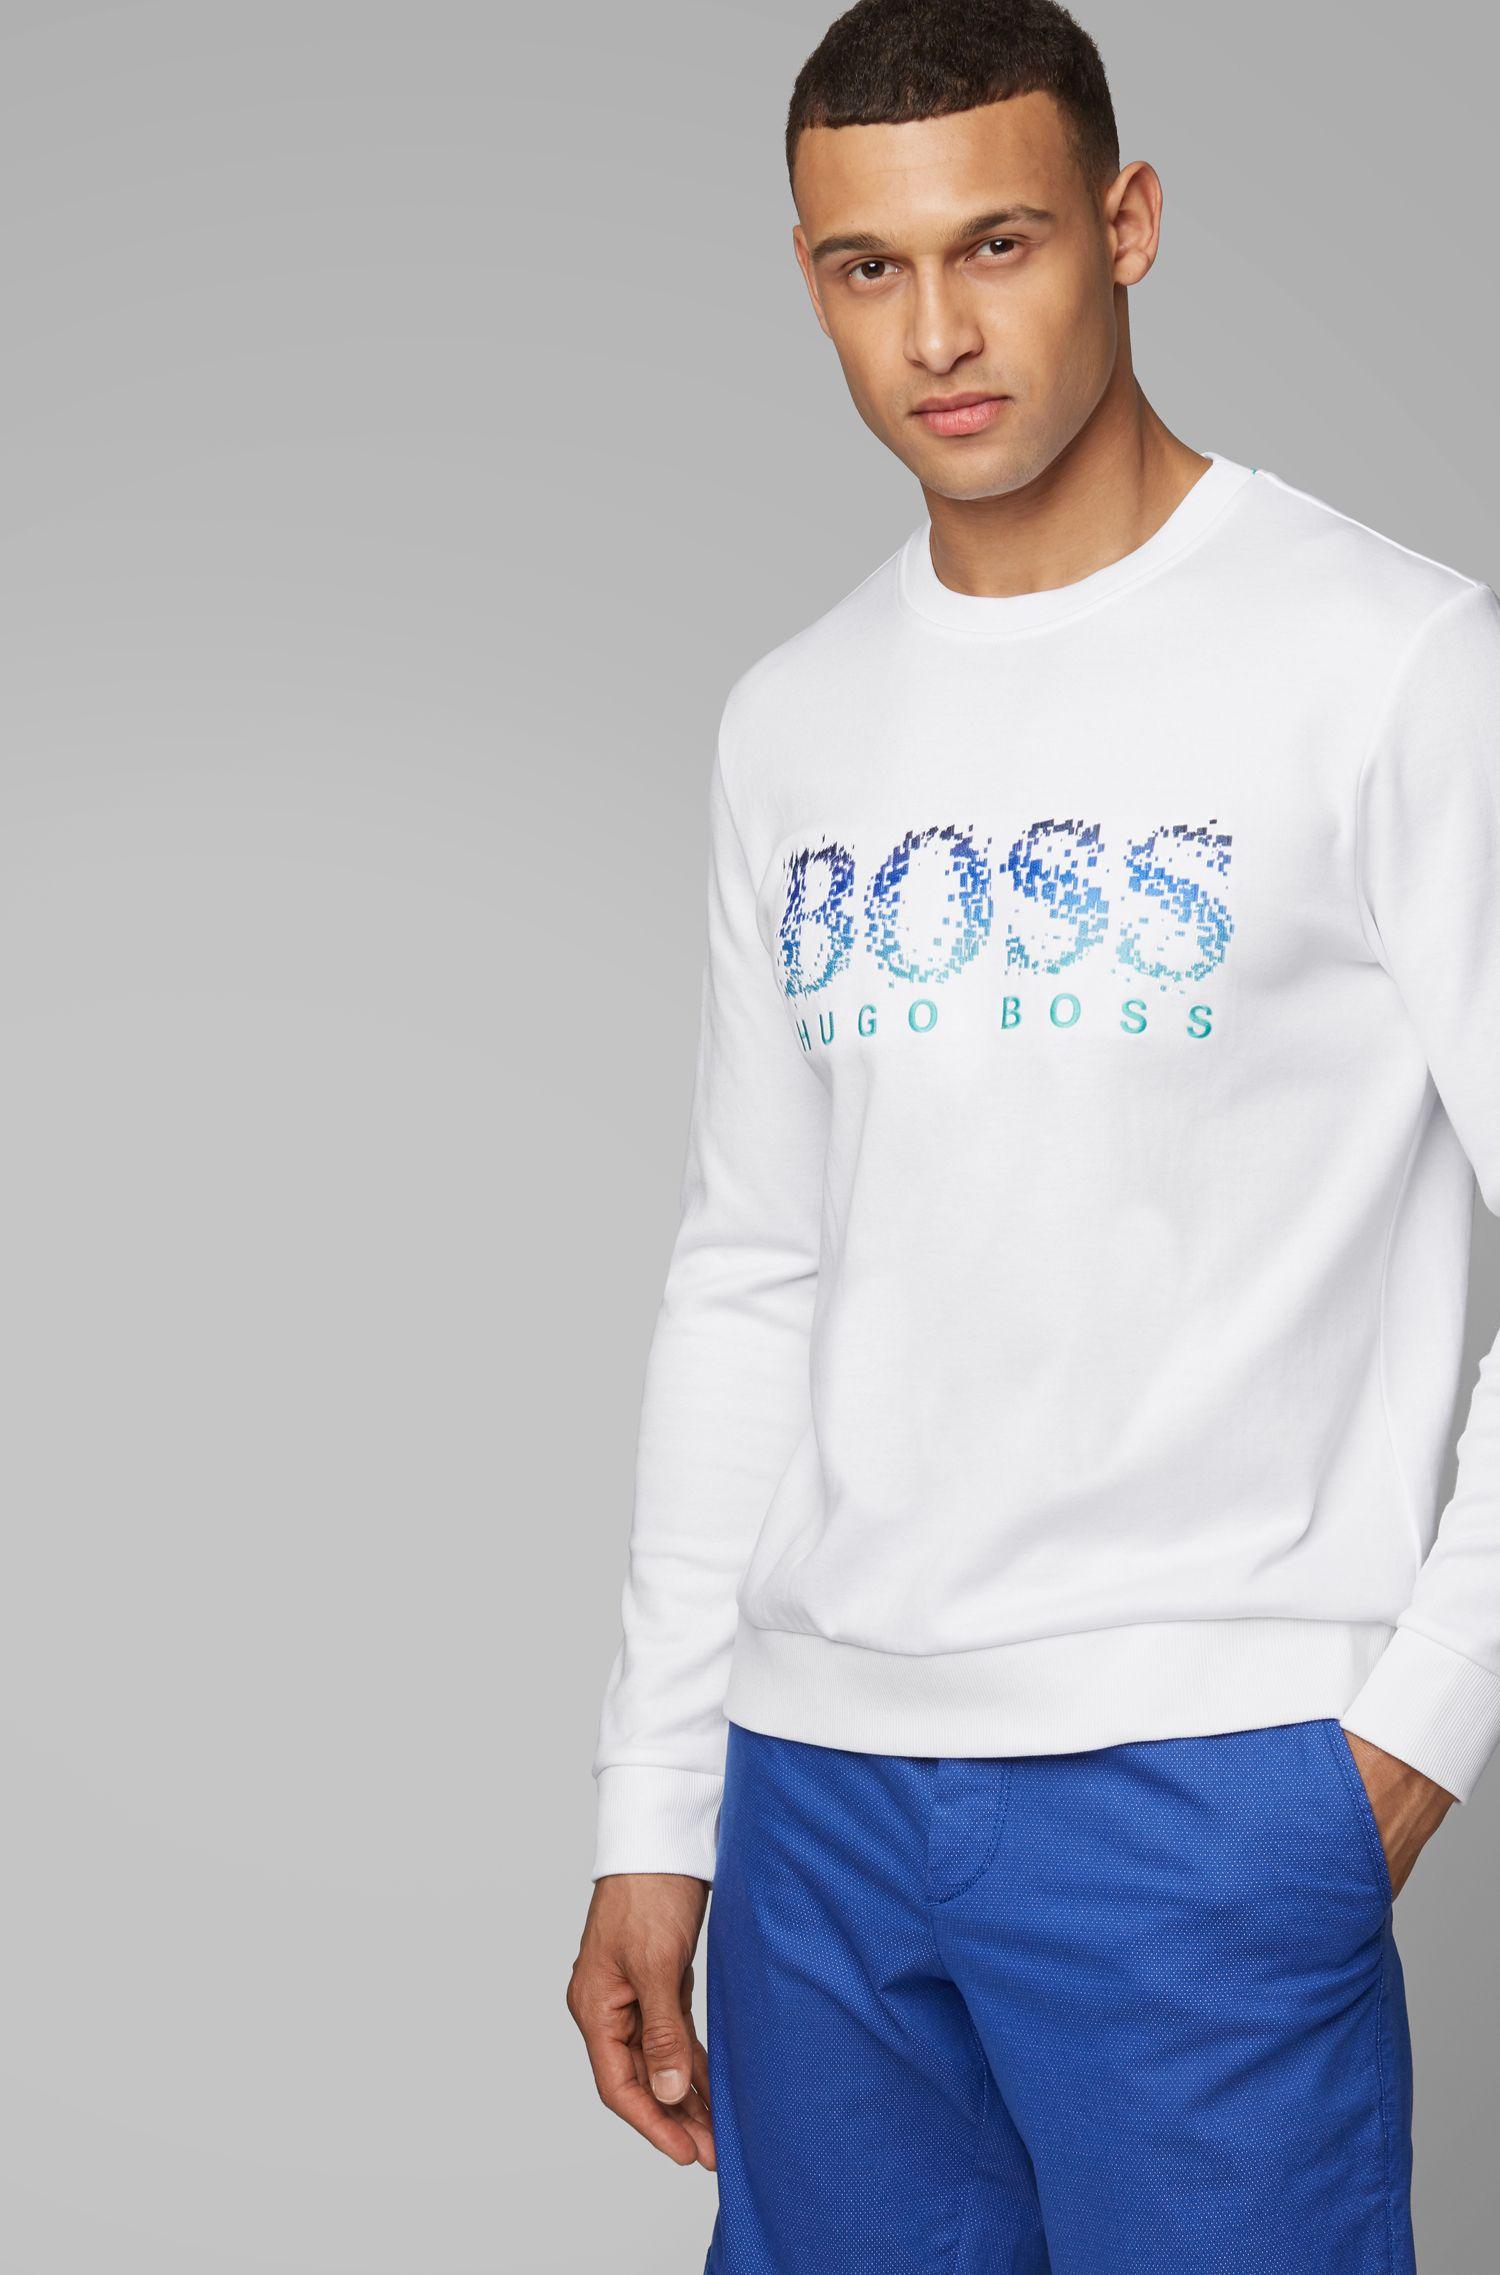 Slim-fit sweatshirt with seasonal logo artwork, White